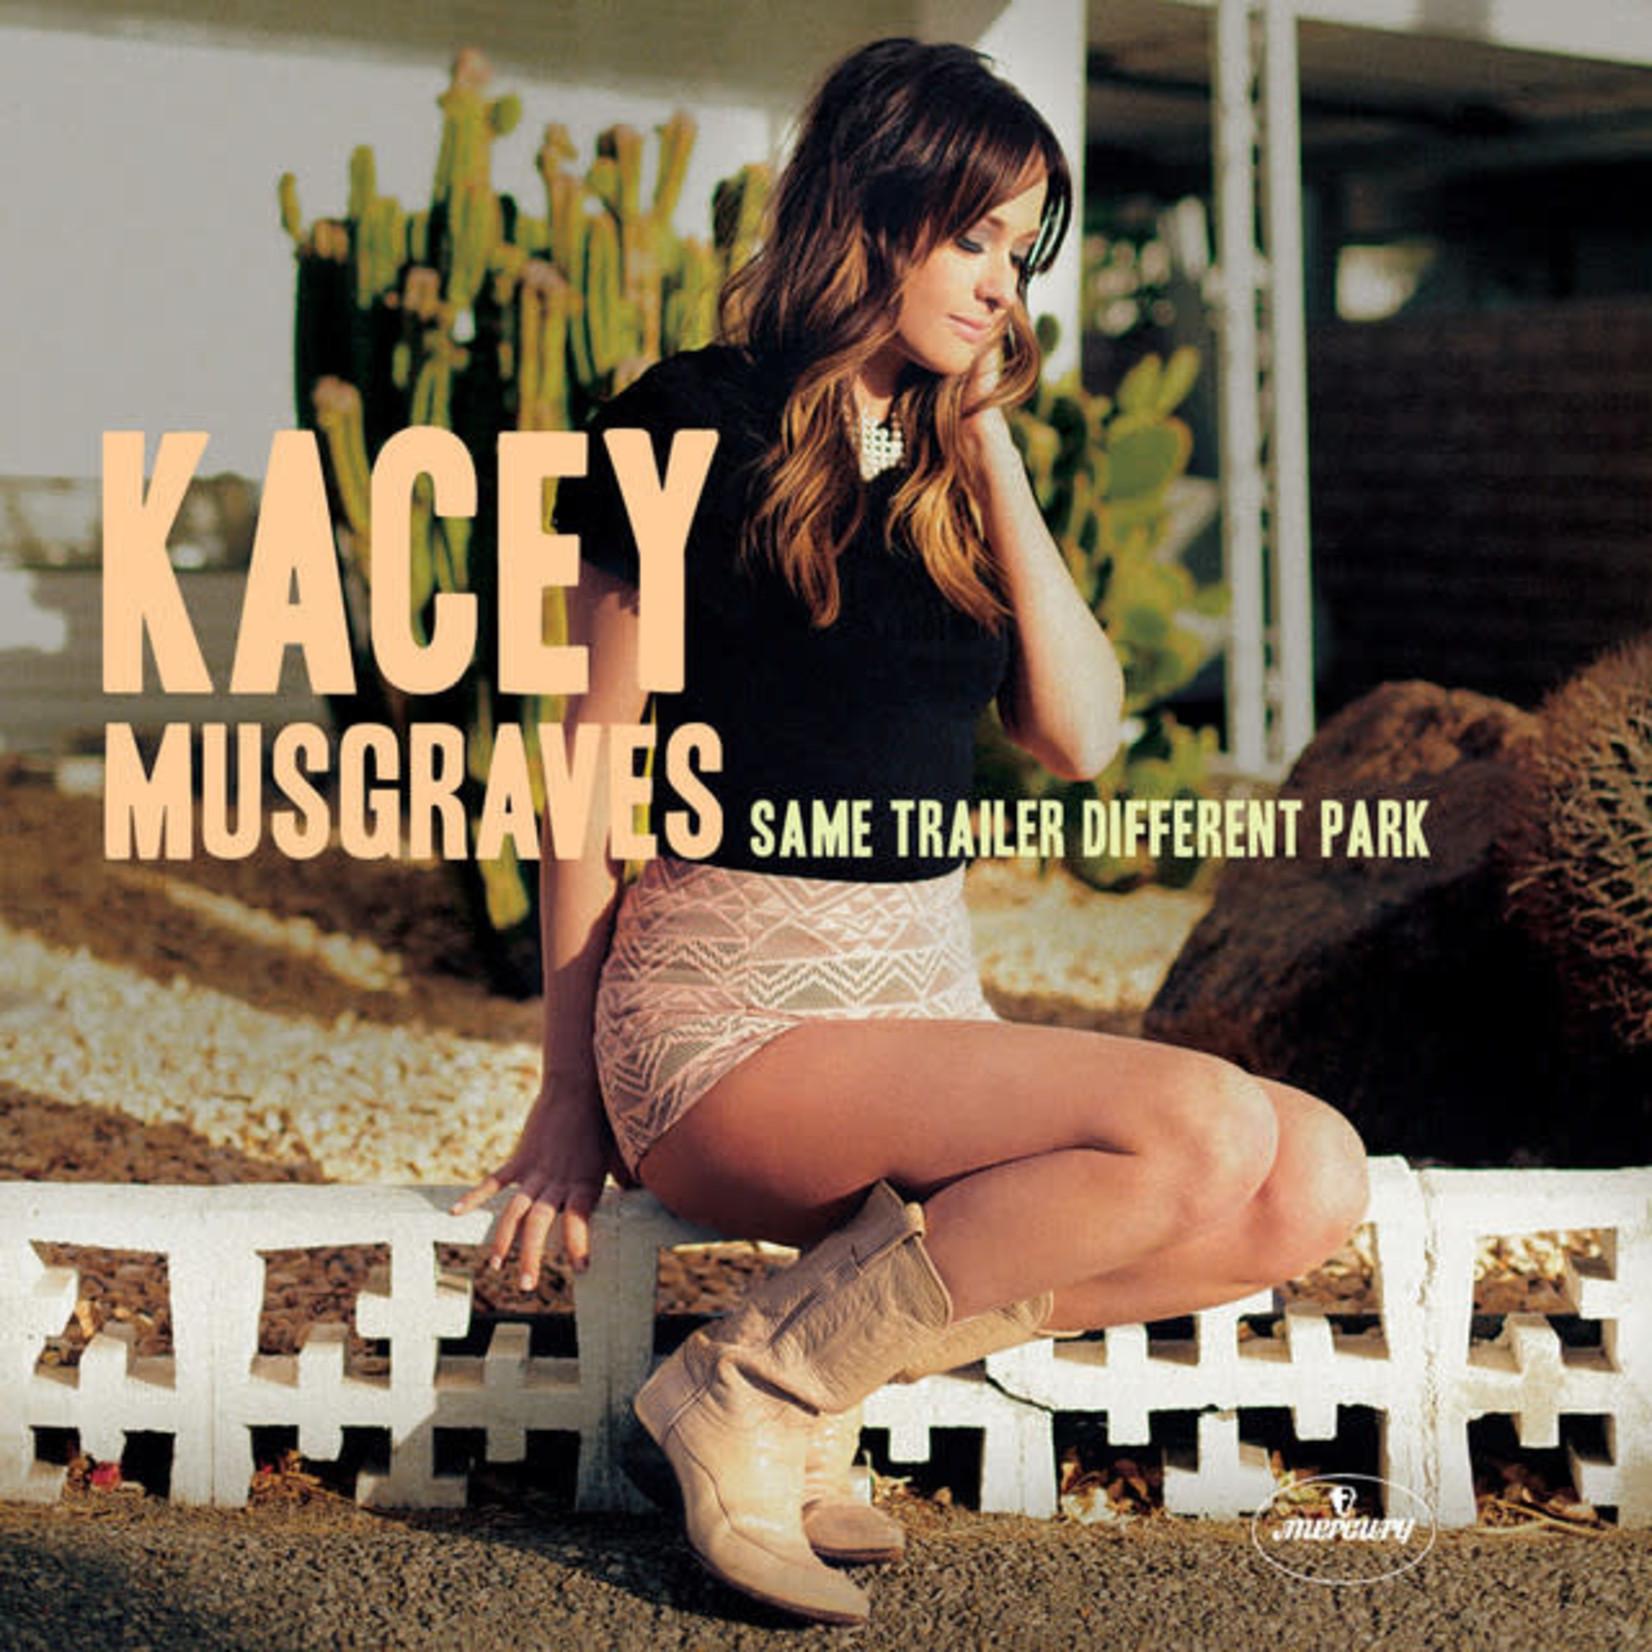 Vinyl Kacey Musgraves - Same Trailer Different Park